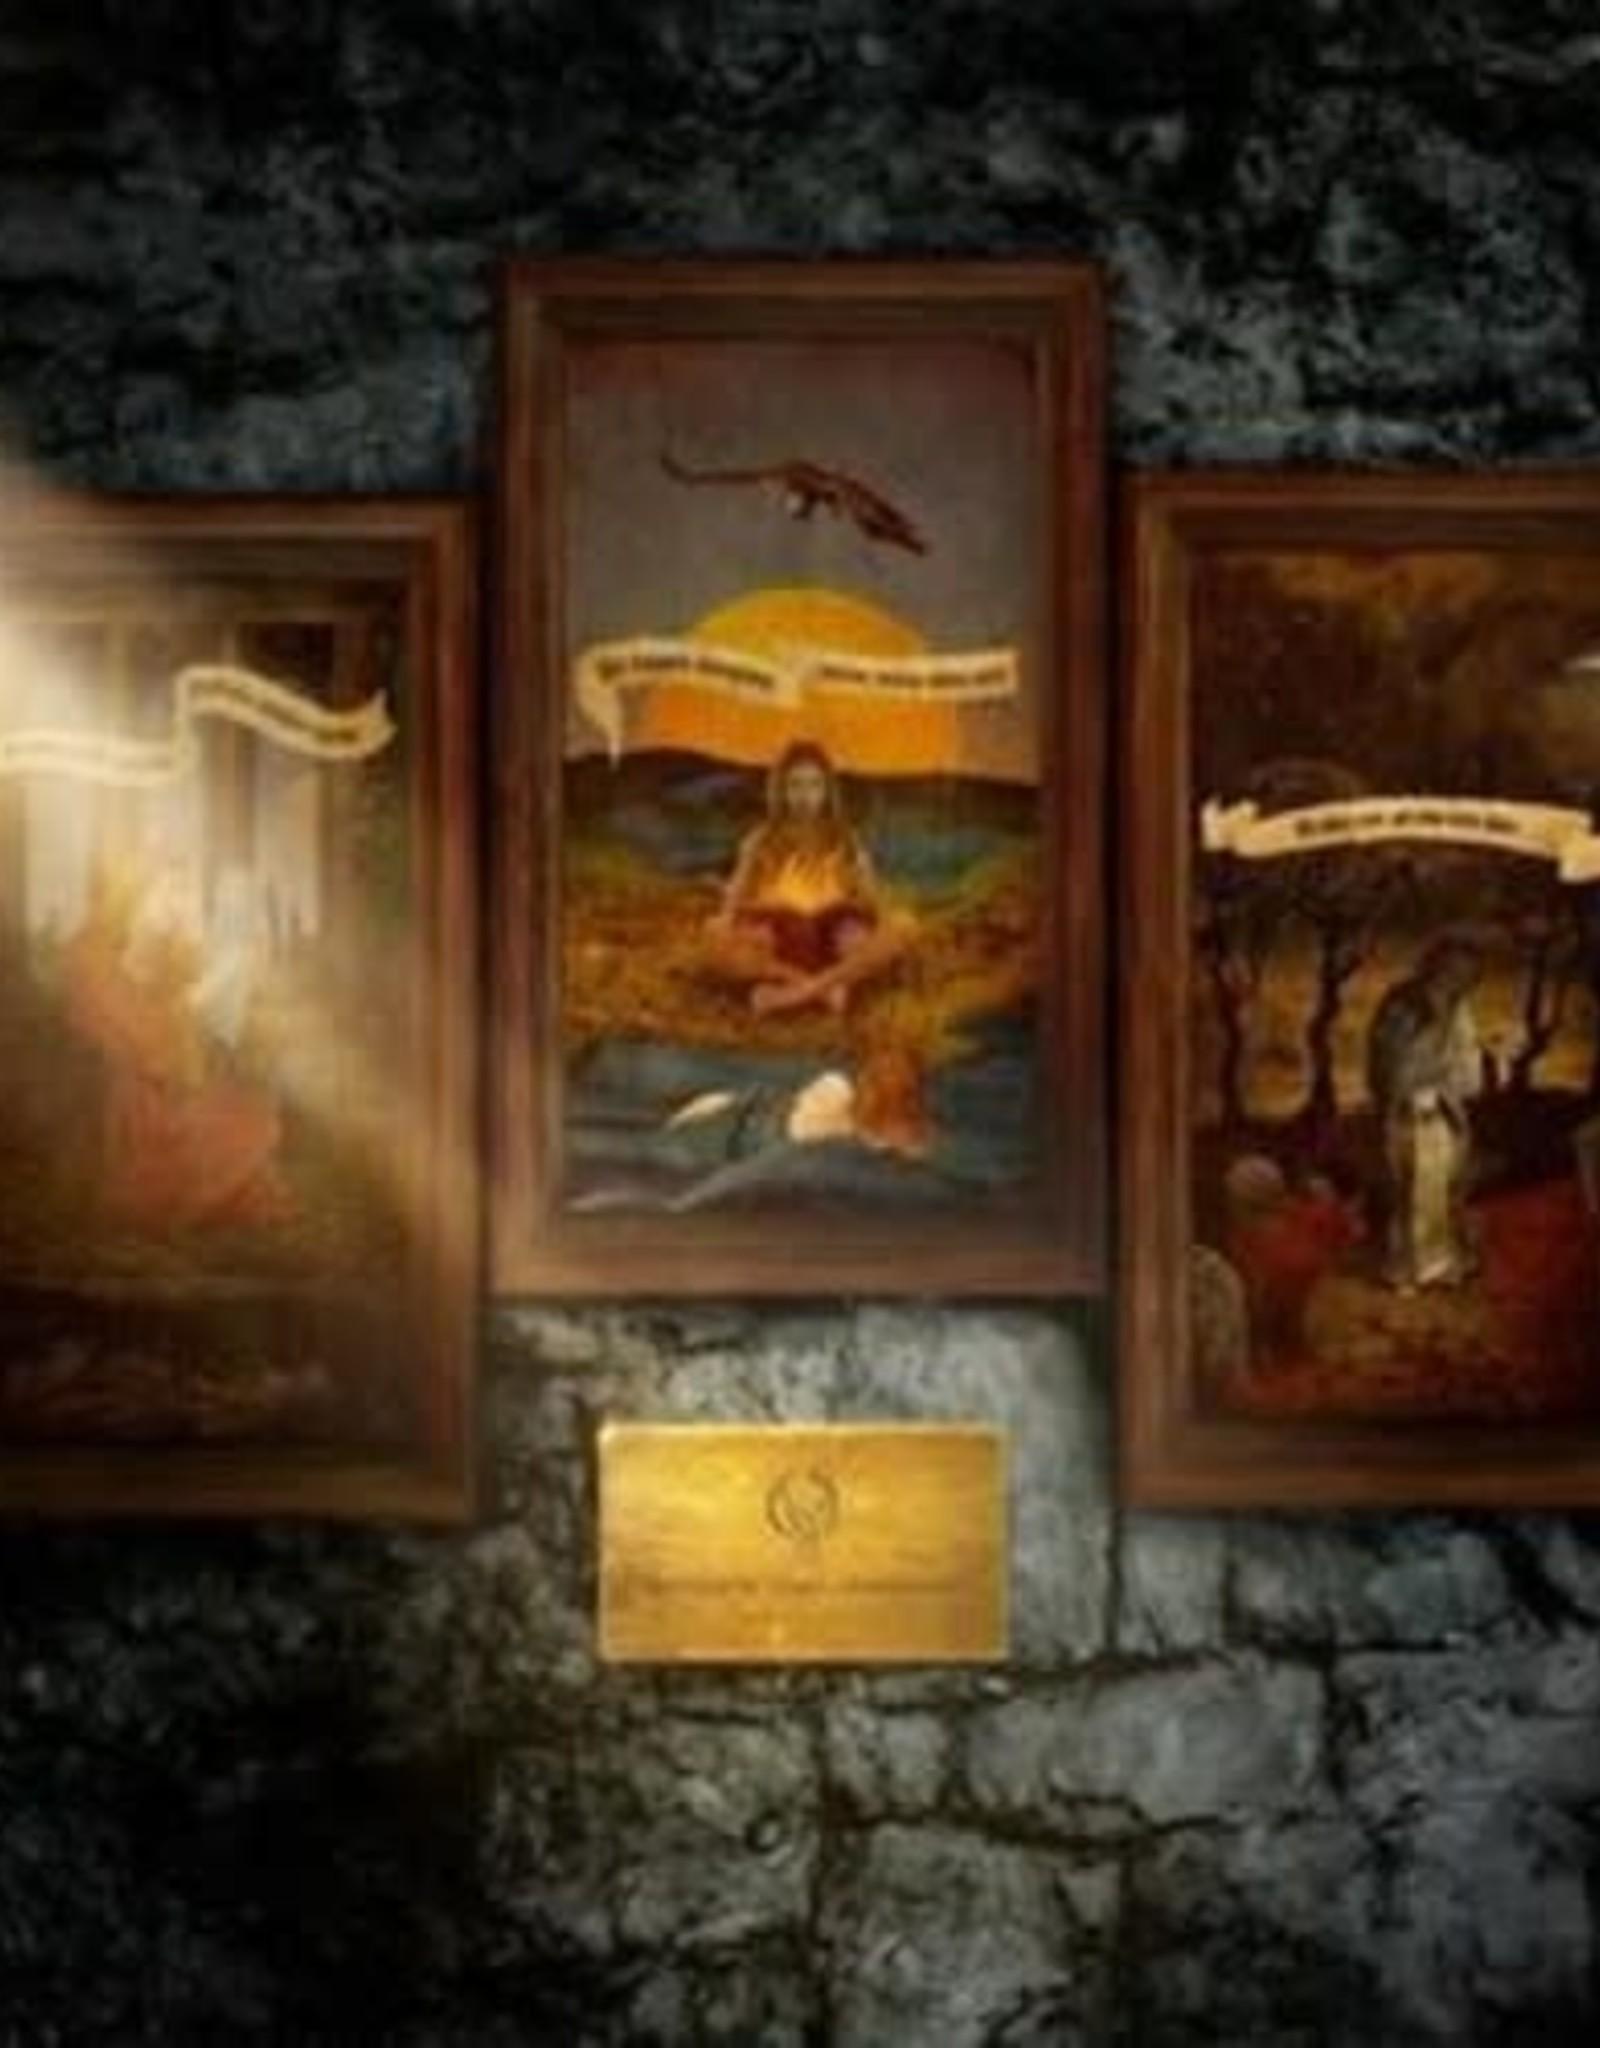 Opeth - Pale Communion (Clear Vinyl)